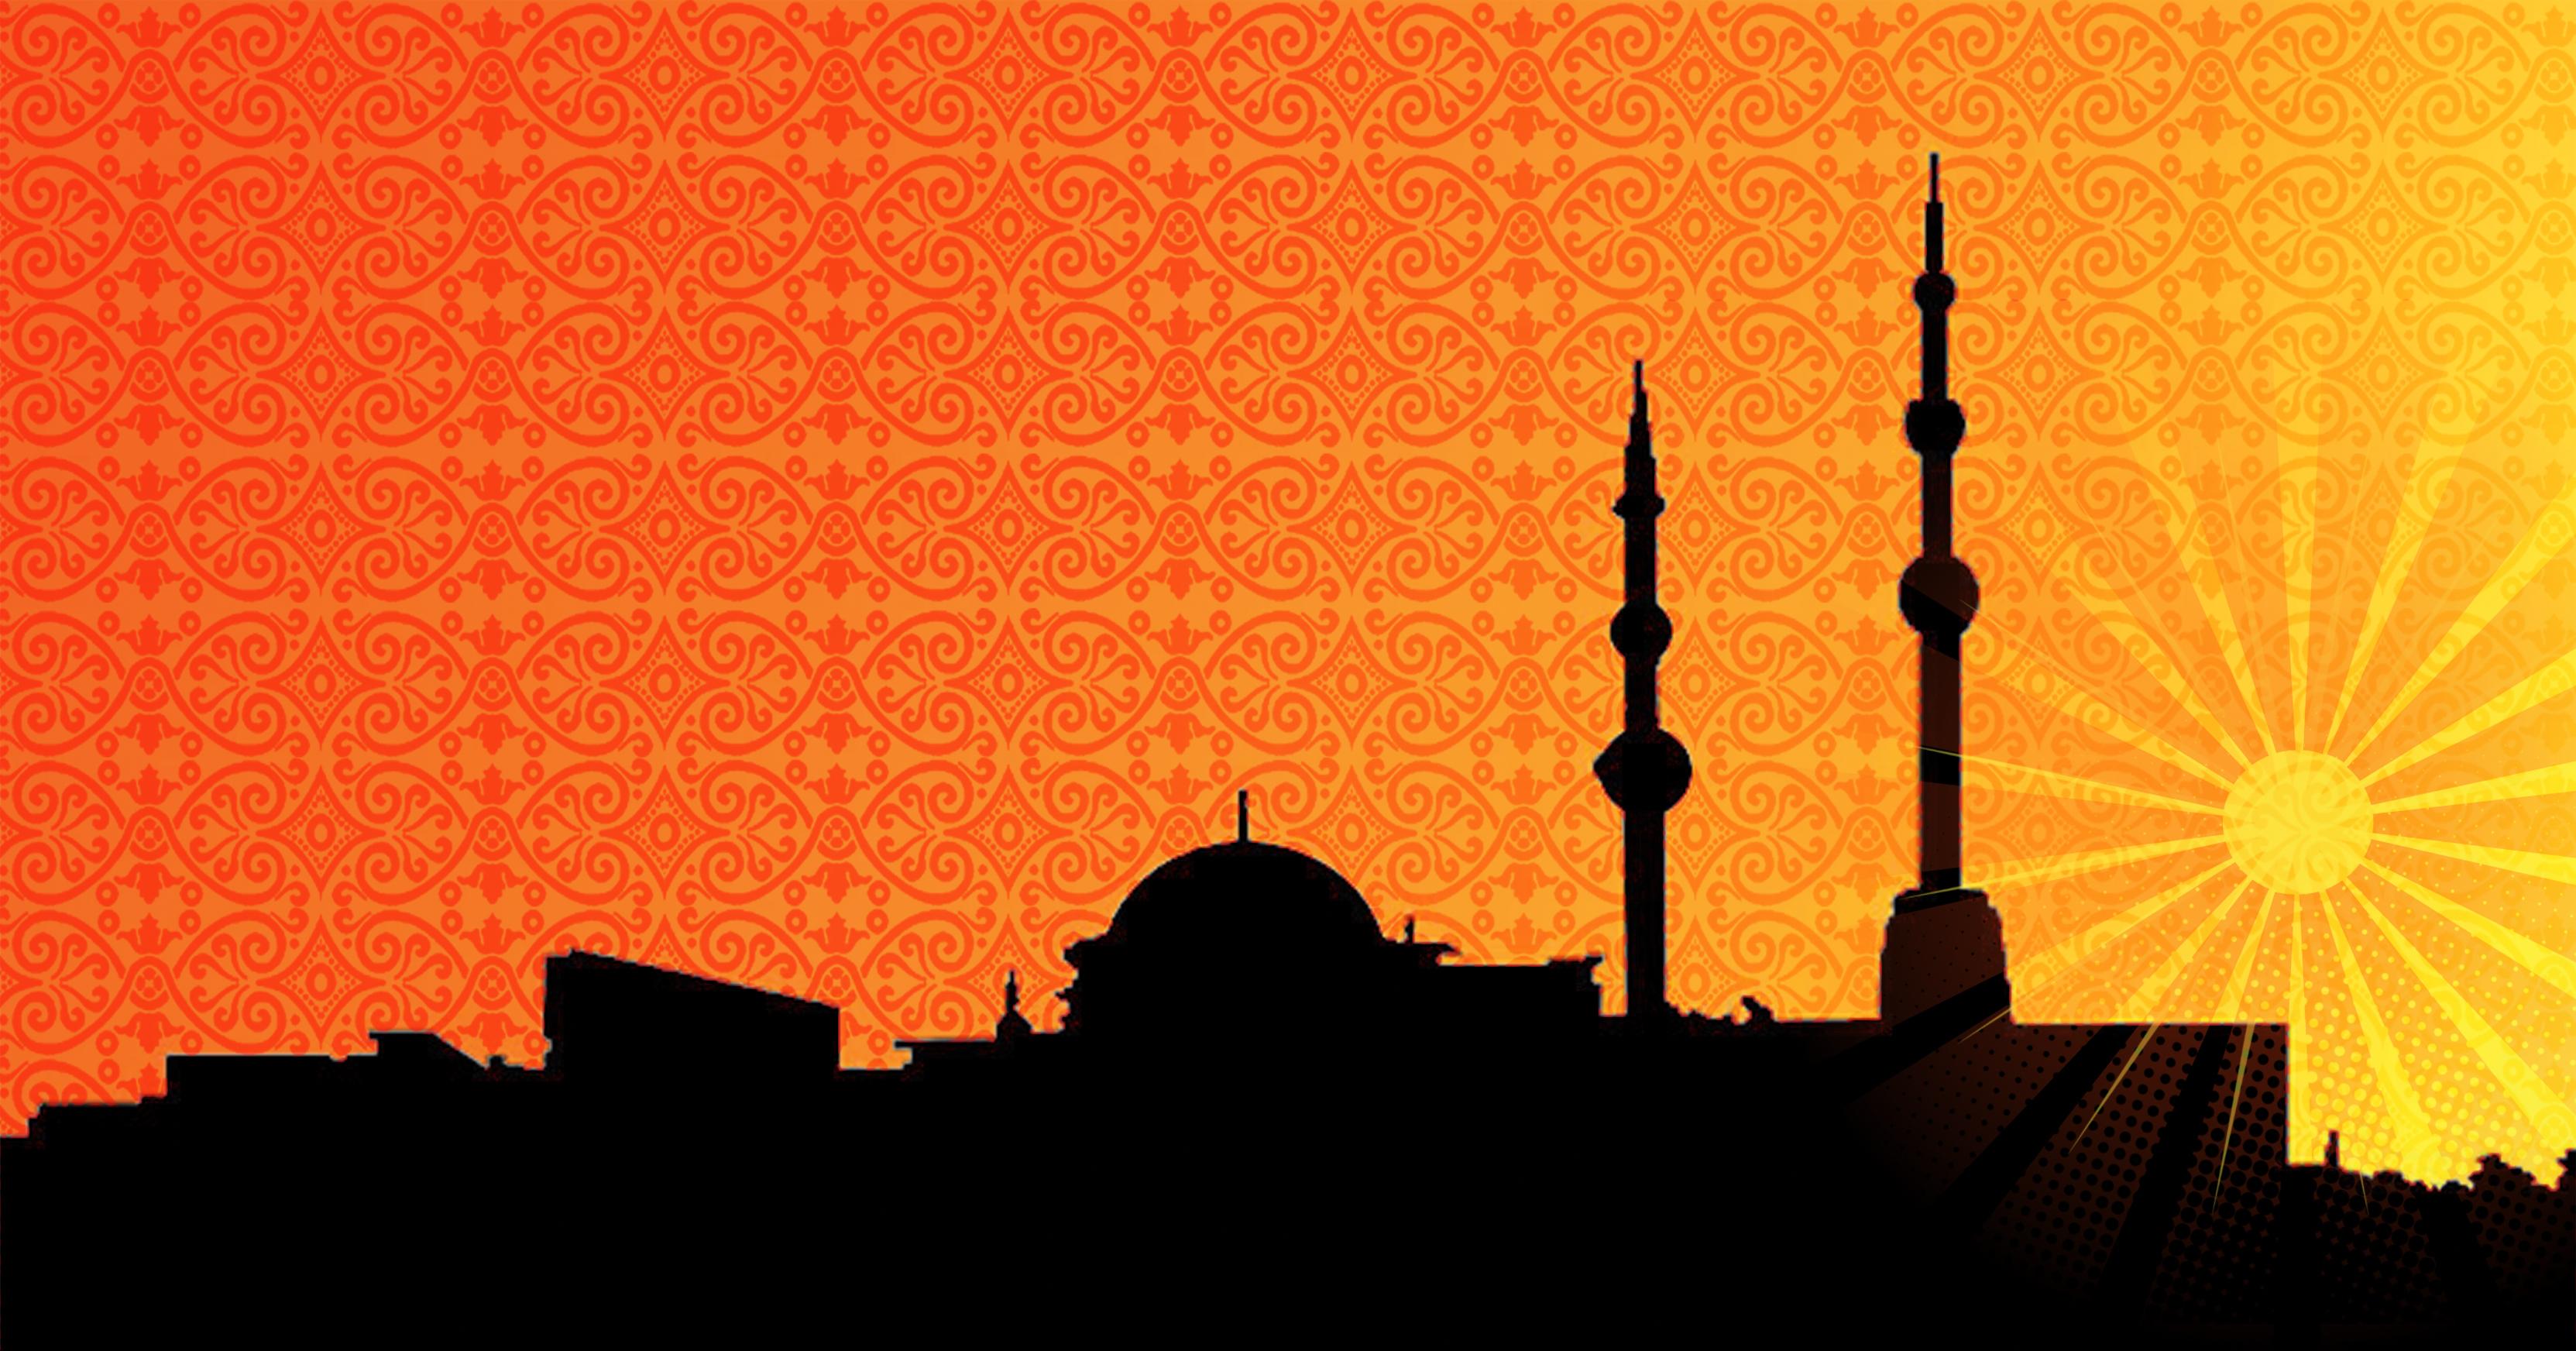 Holidays___Ramadan_Sunrise_in_Ramadan_056451_